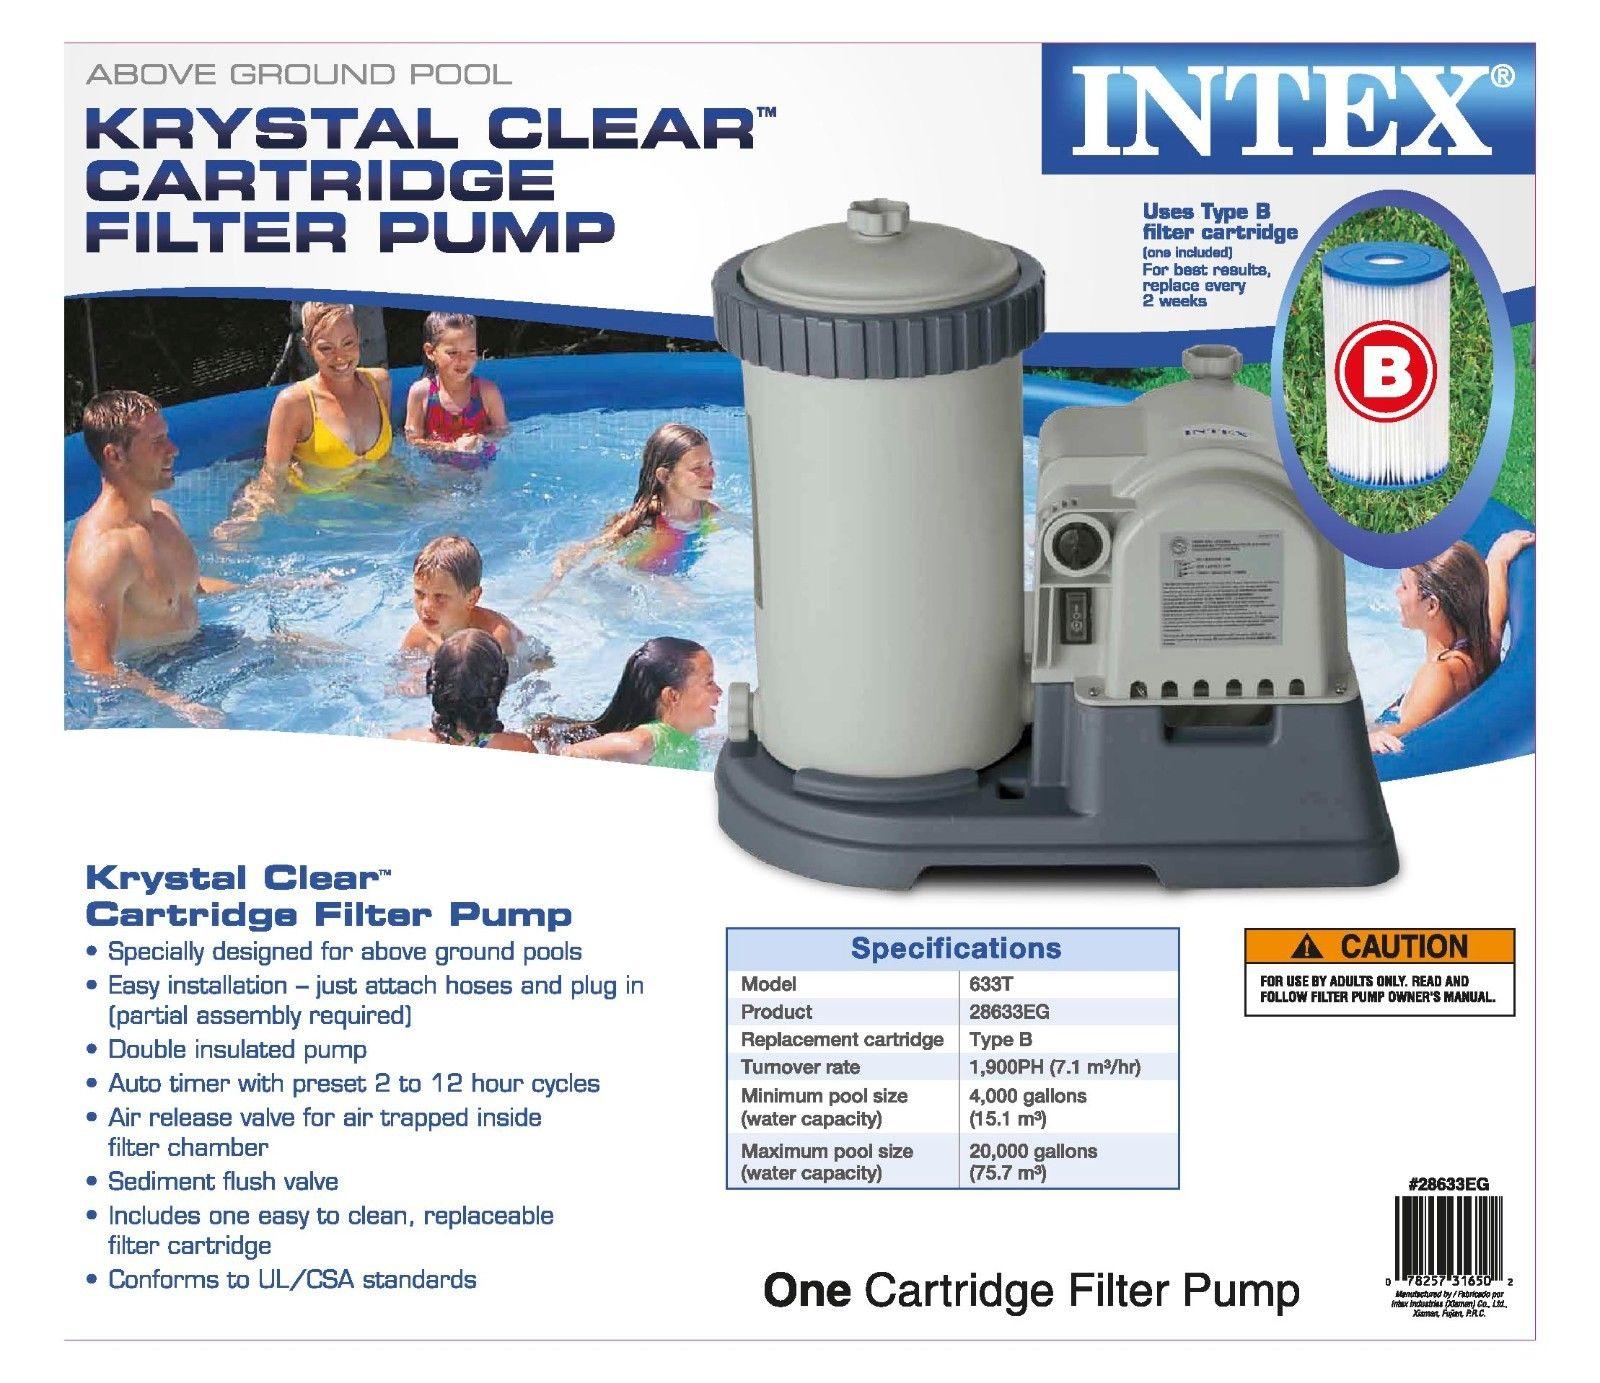 Intex Pool Plumbing : Intex gph krystal clear gfci pool filter pump with